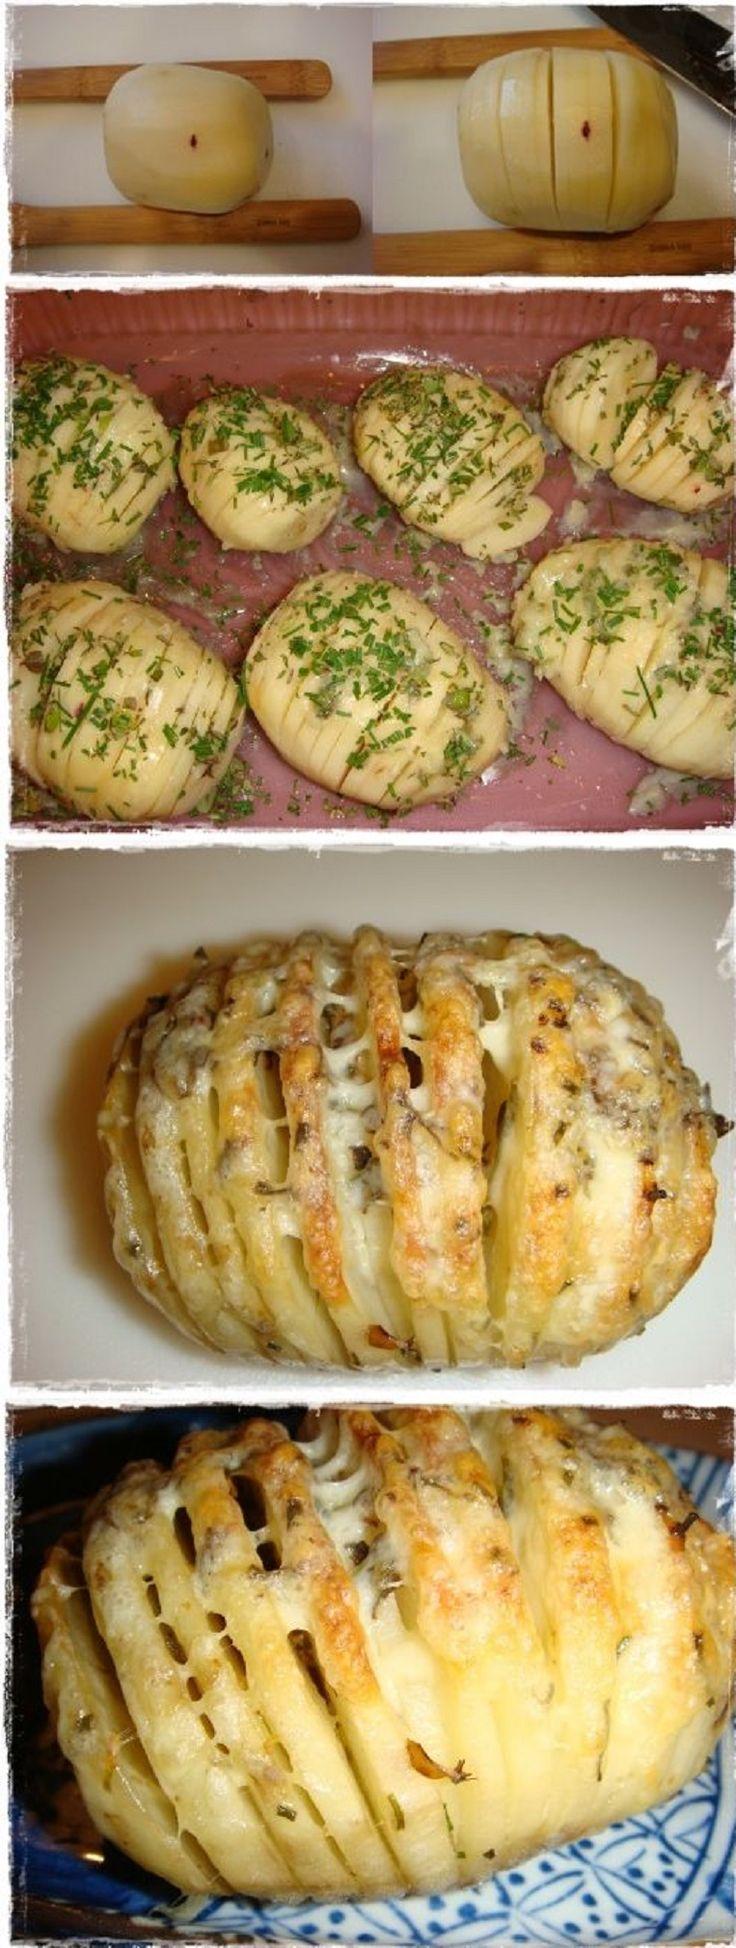 14 Unbelievably Good Baked Potato Recipes - GleamItUp